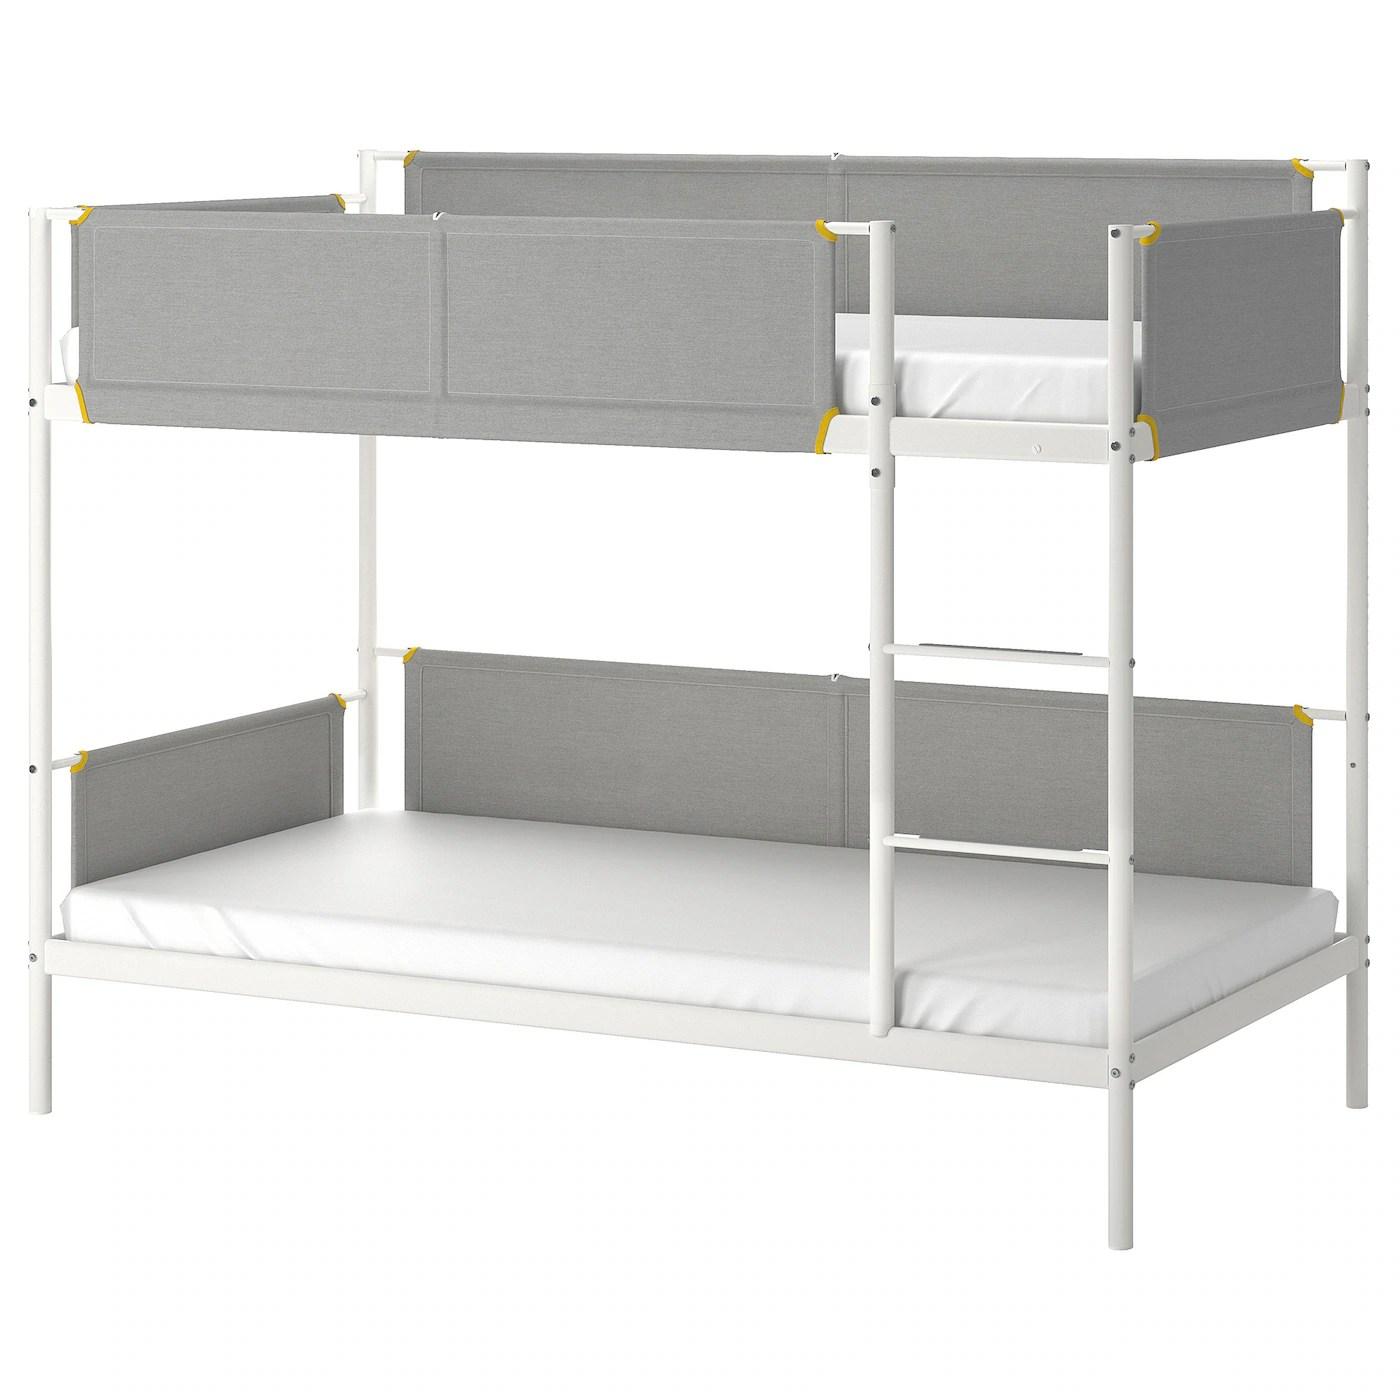 Vitval Structure Lits Superposes Blanc Gris Clair 90x200 Cm Ikea